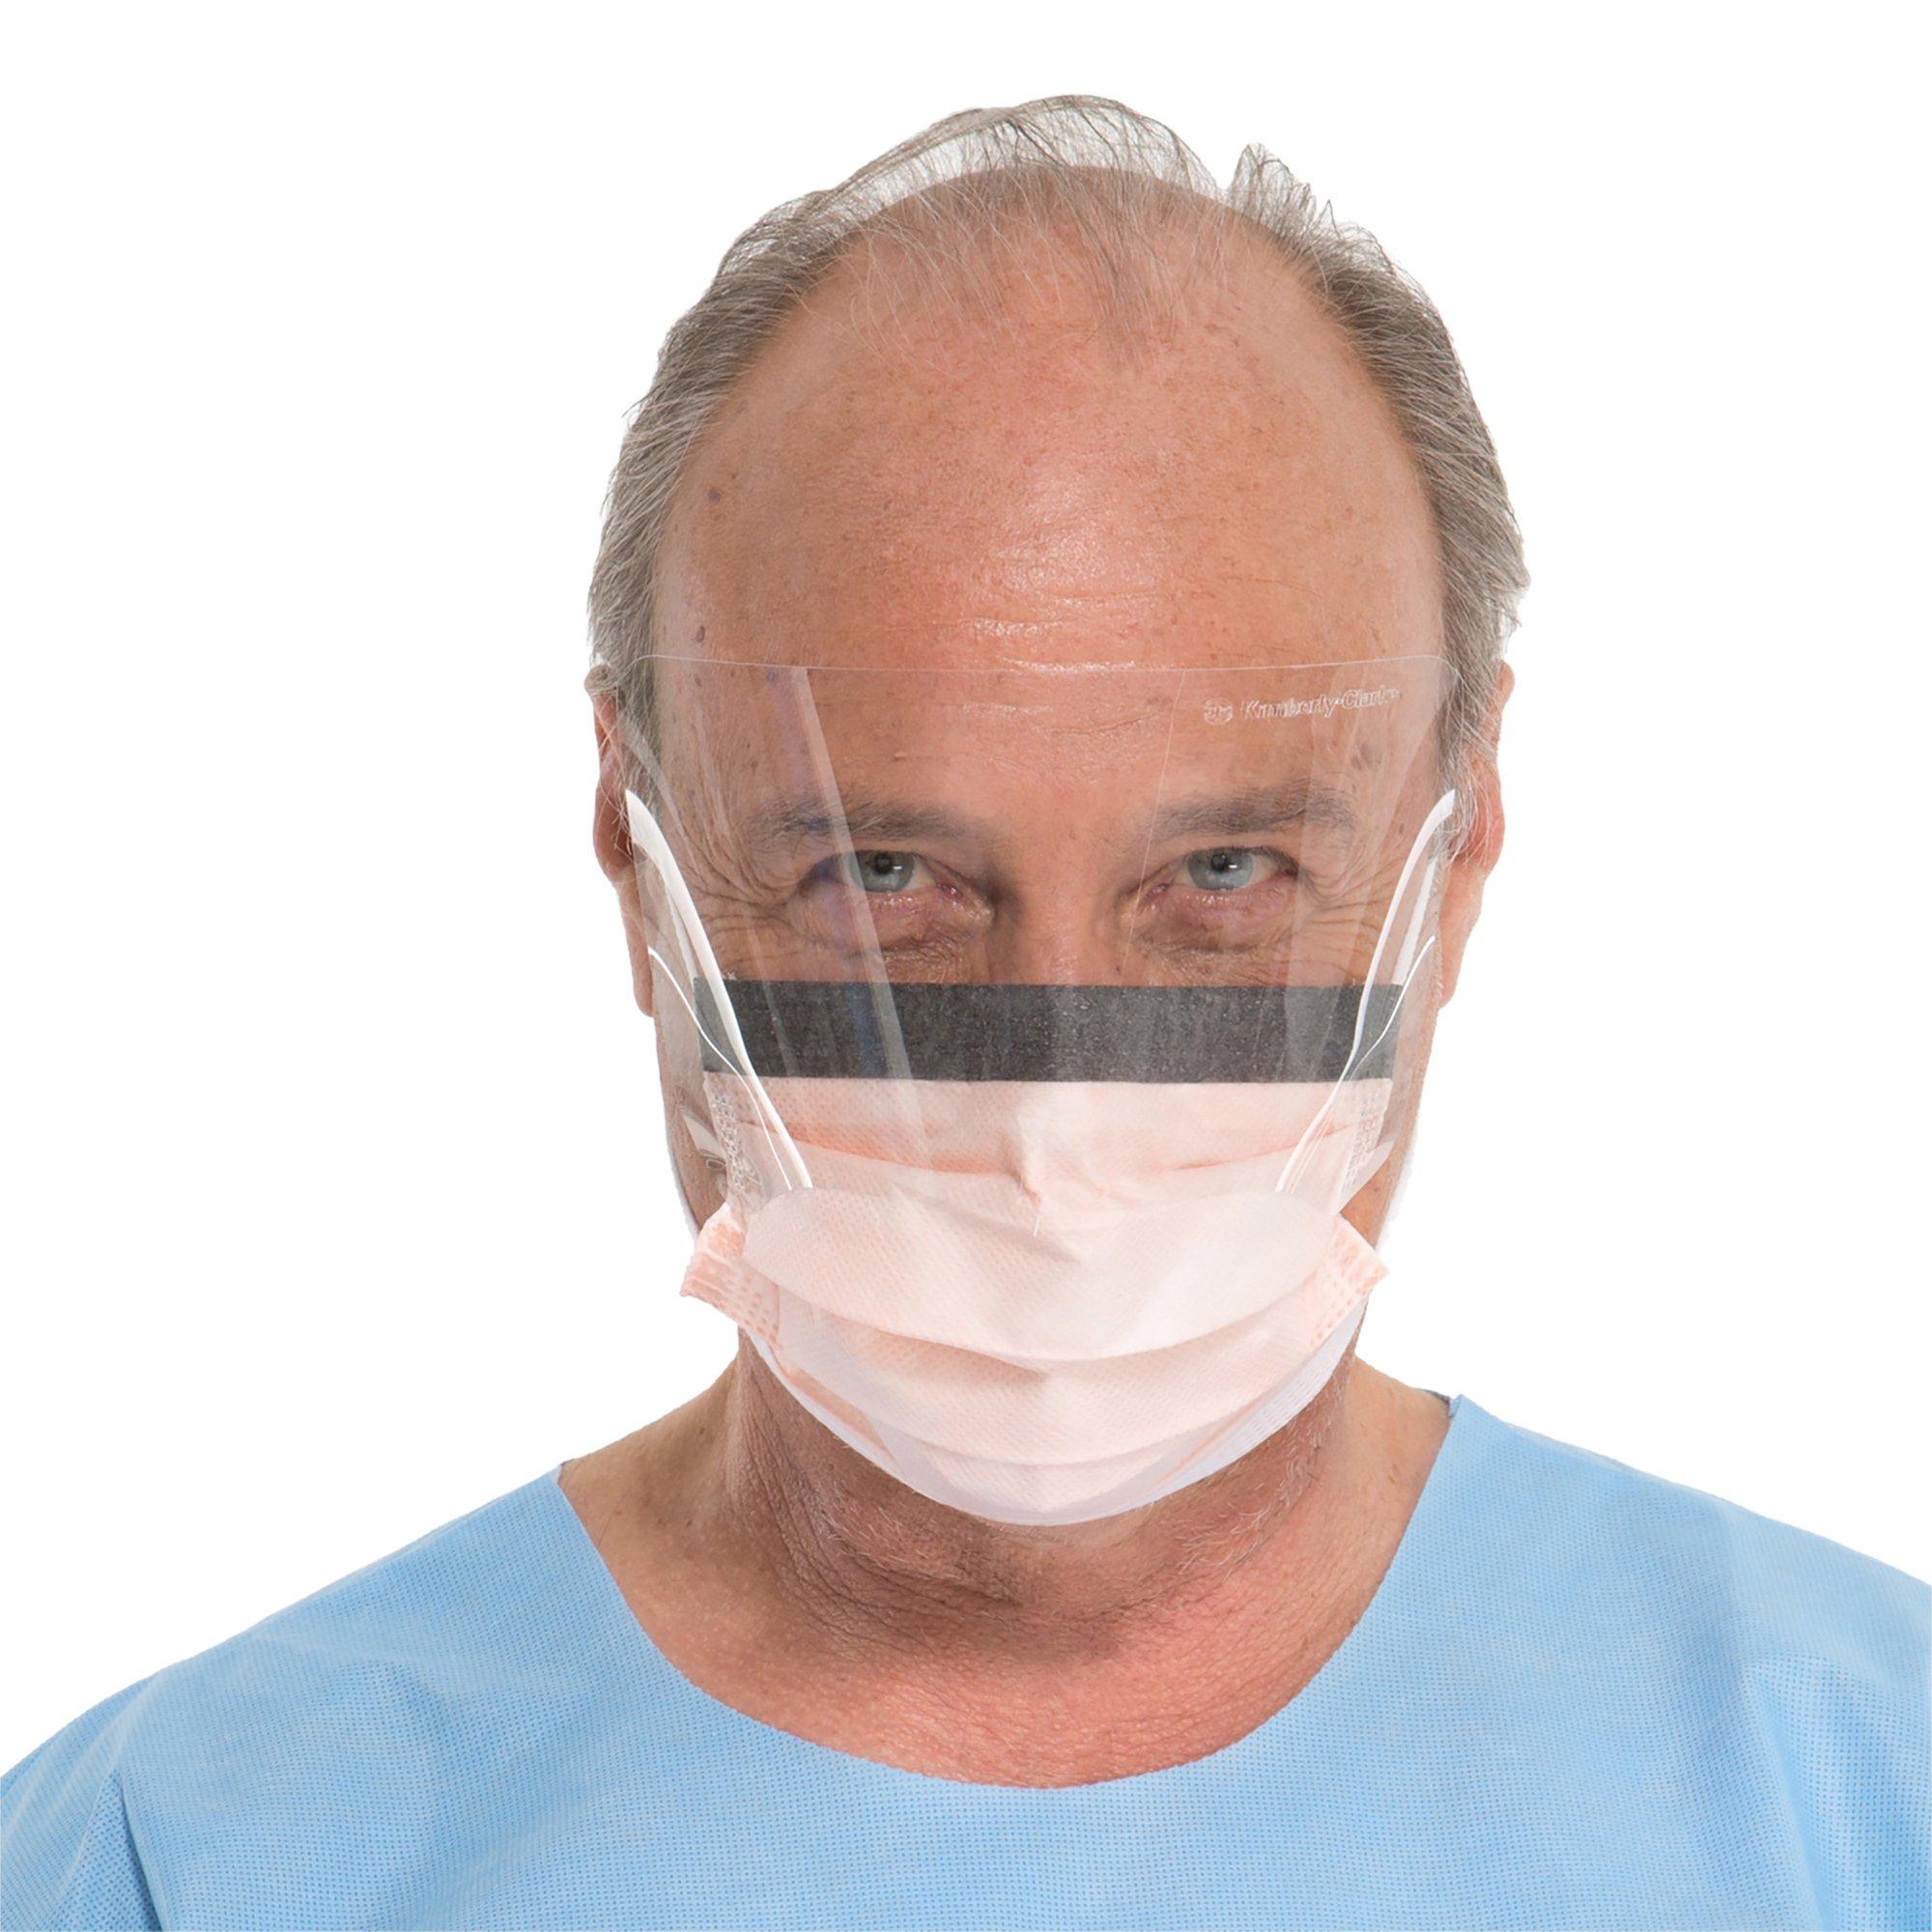 Kimberly-Clark Fluidshield Face Mask (47137), Orange Pleated Procedure Mask with Clear Splashguard Visor, Earloops, Fog-Free, 25 / Box